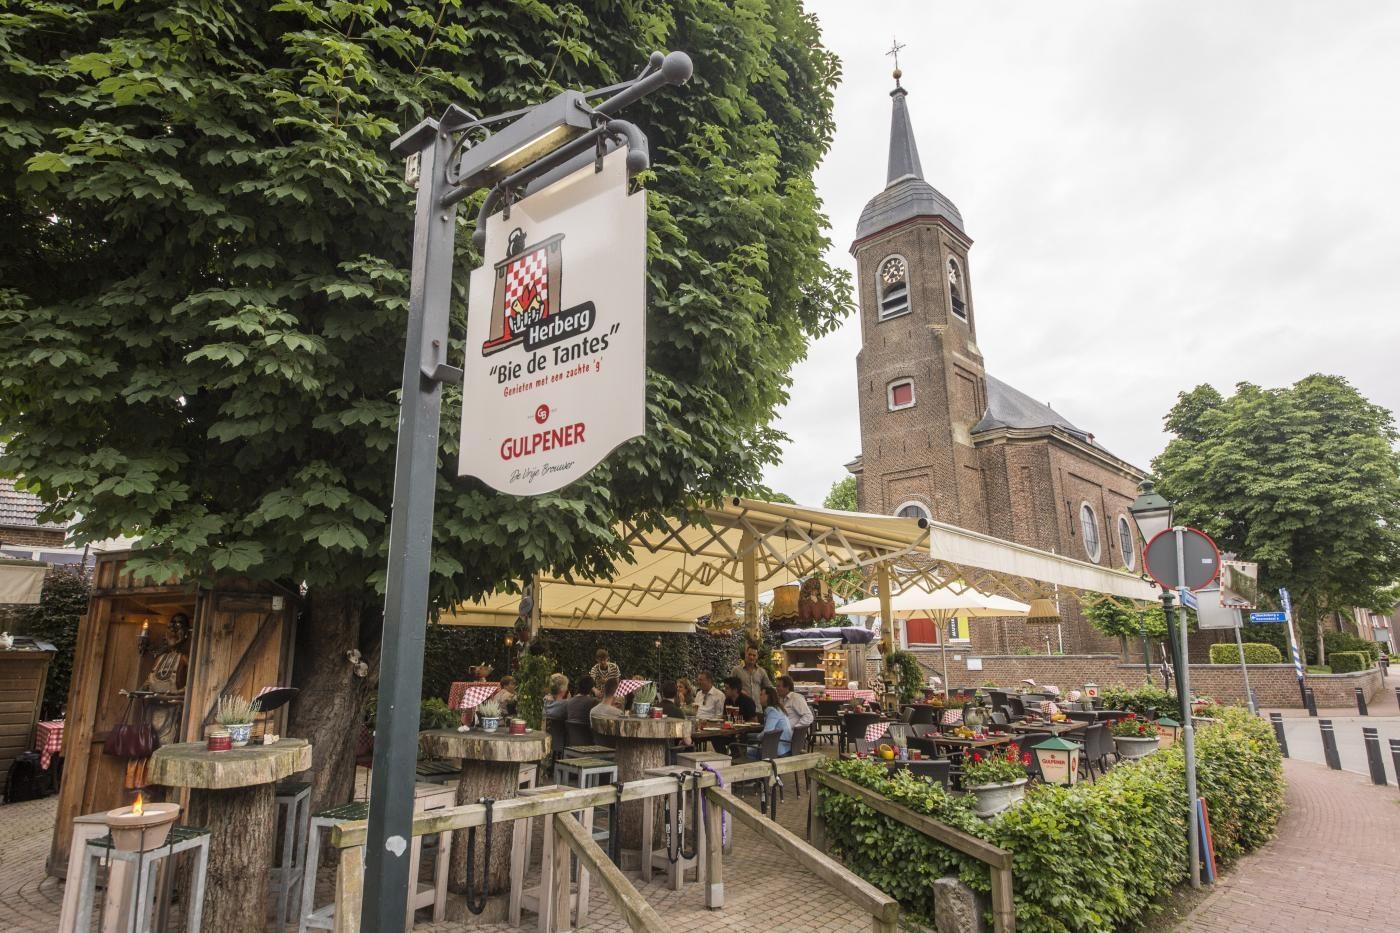 Bie de Tantes Eys Horecare Personeel Payrolling Events Maastricht Limburg